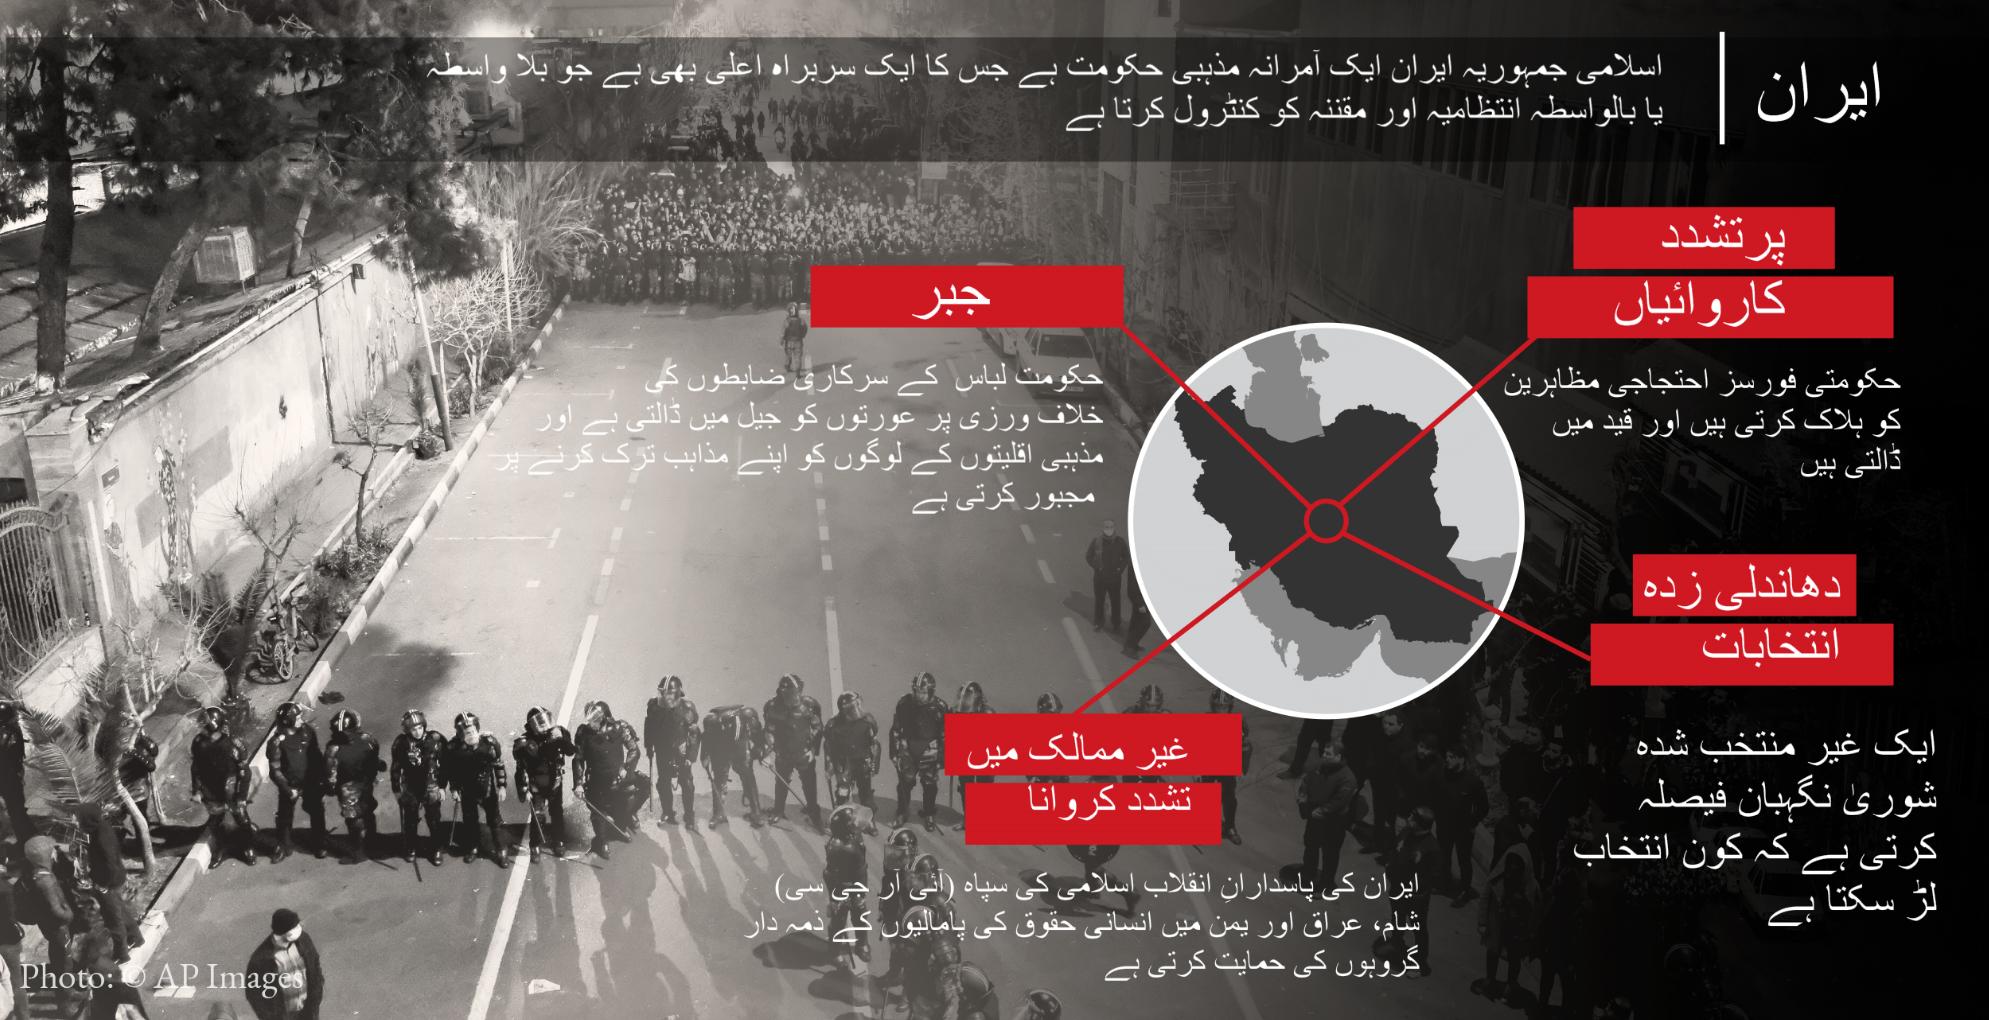 © AP Images کی تصویر پر چسپاں ایران میں انسانی حقوق کی صورت حال کے بارے میں تصویری خاکہ۔ (State Dept.)